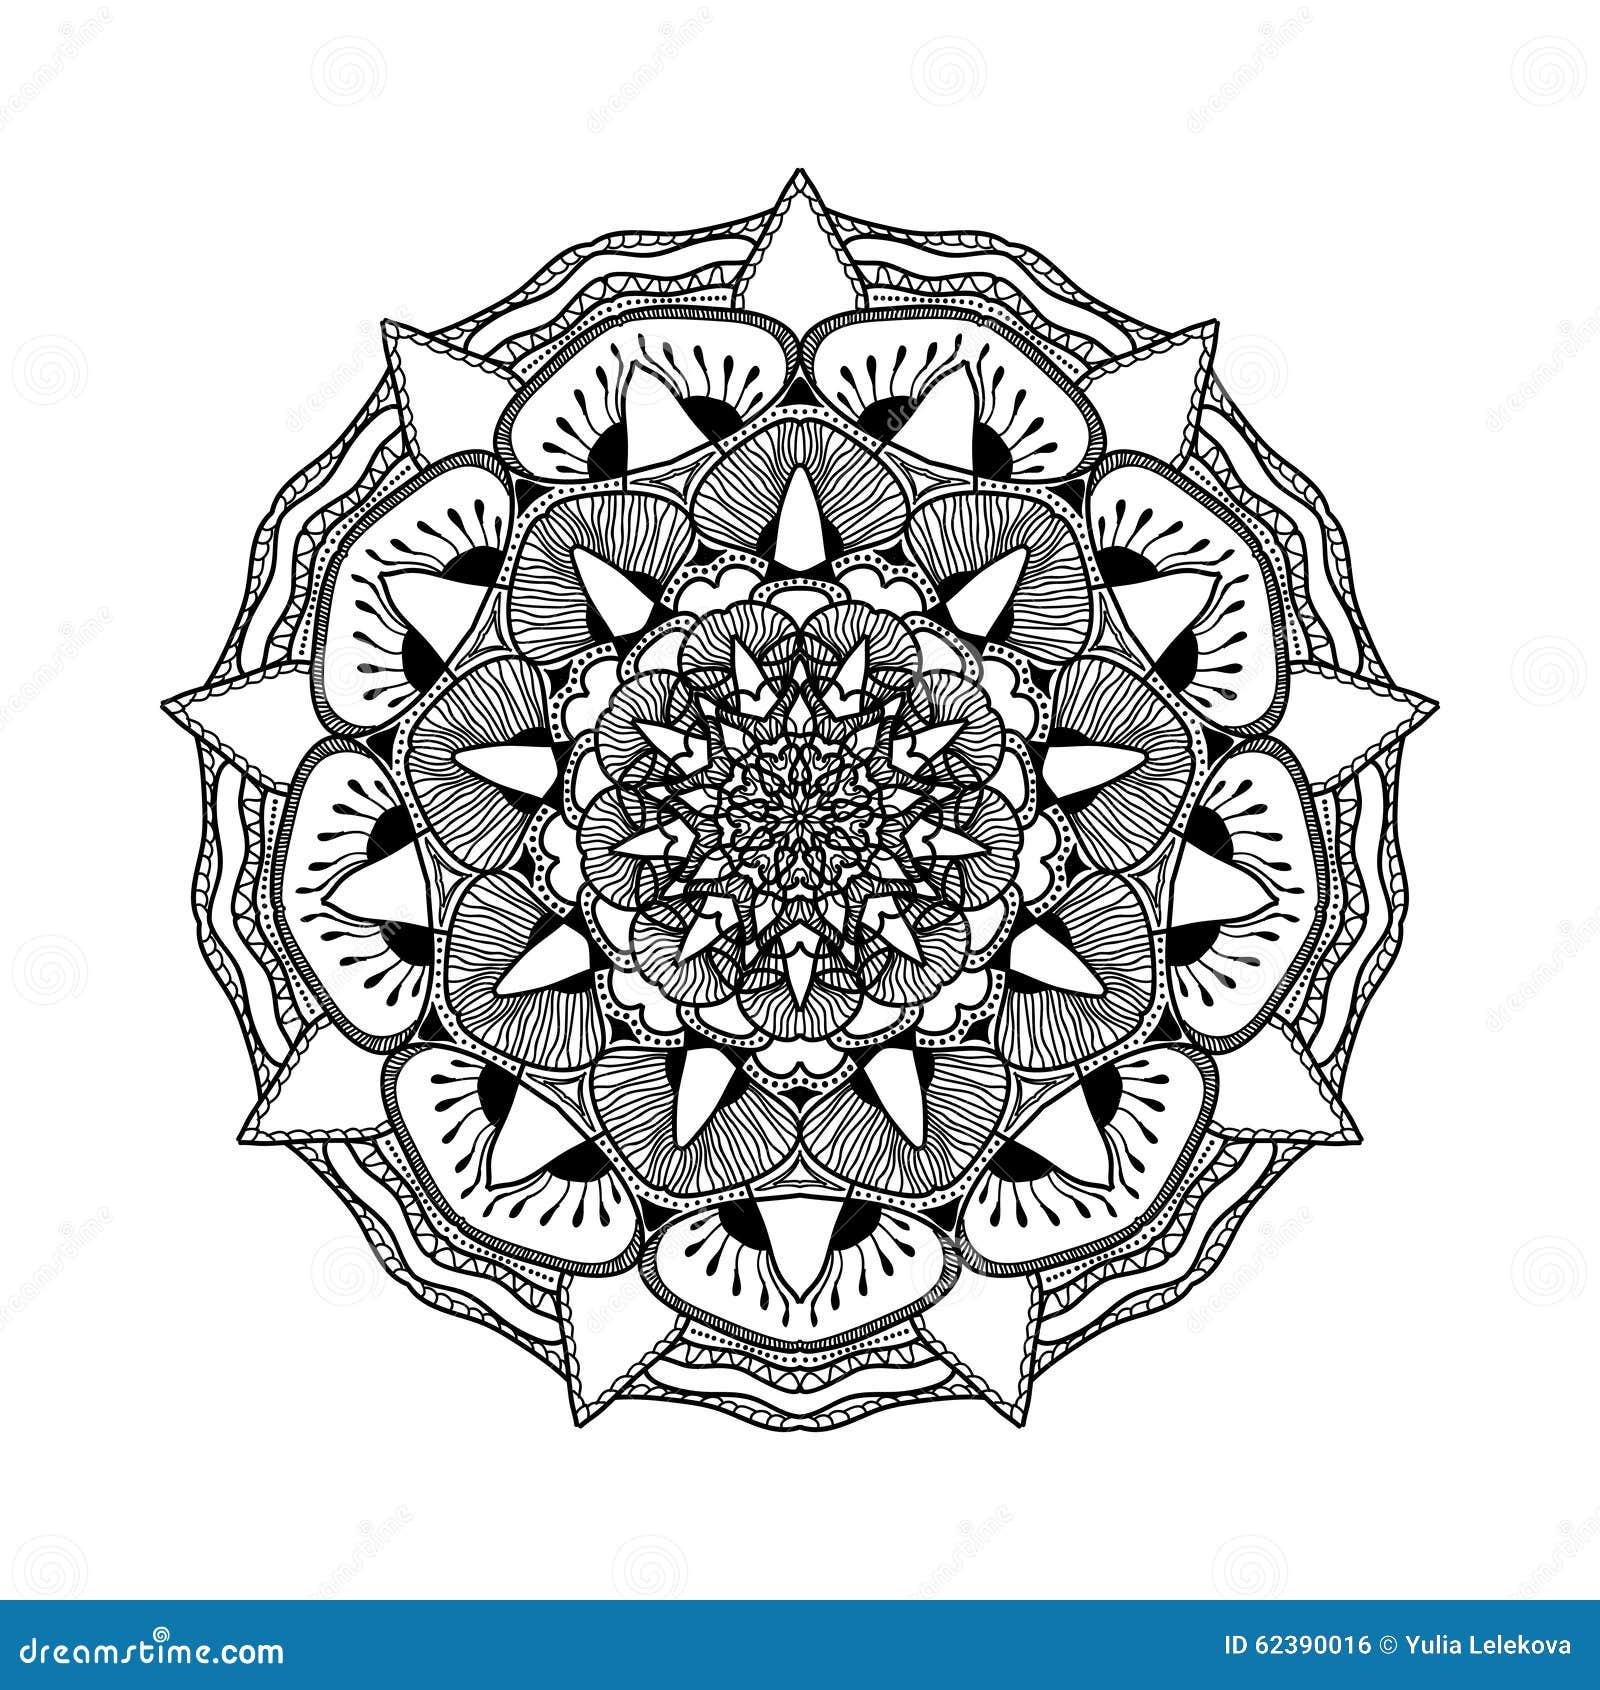 sch ne mandala des vektors schwarzweiss muster f r design und malerei vektor abbildung. Black Bedroom Furniture Sets. Home Design Ideas